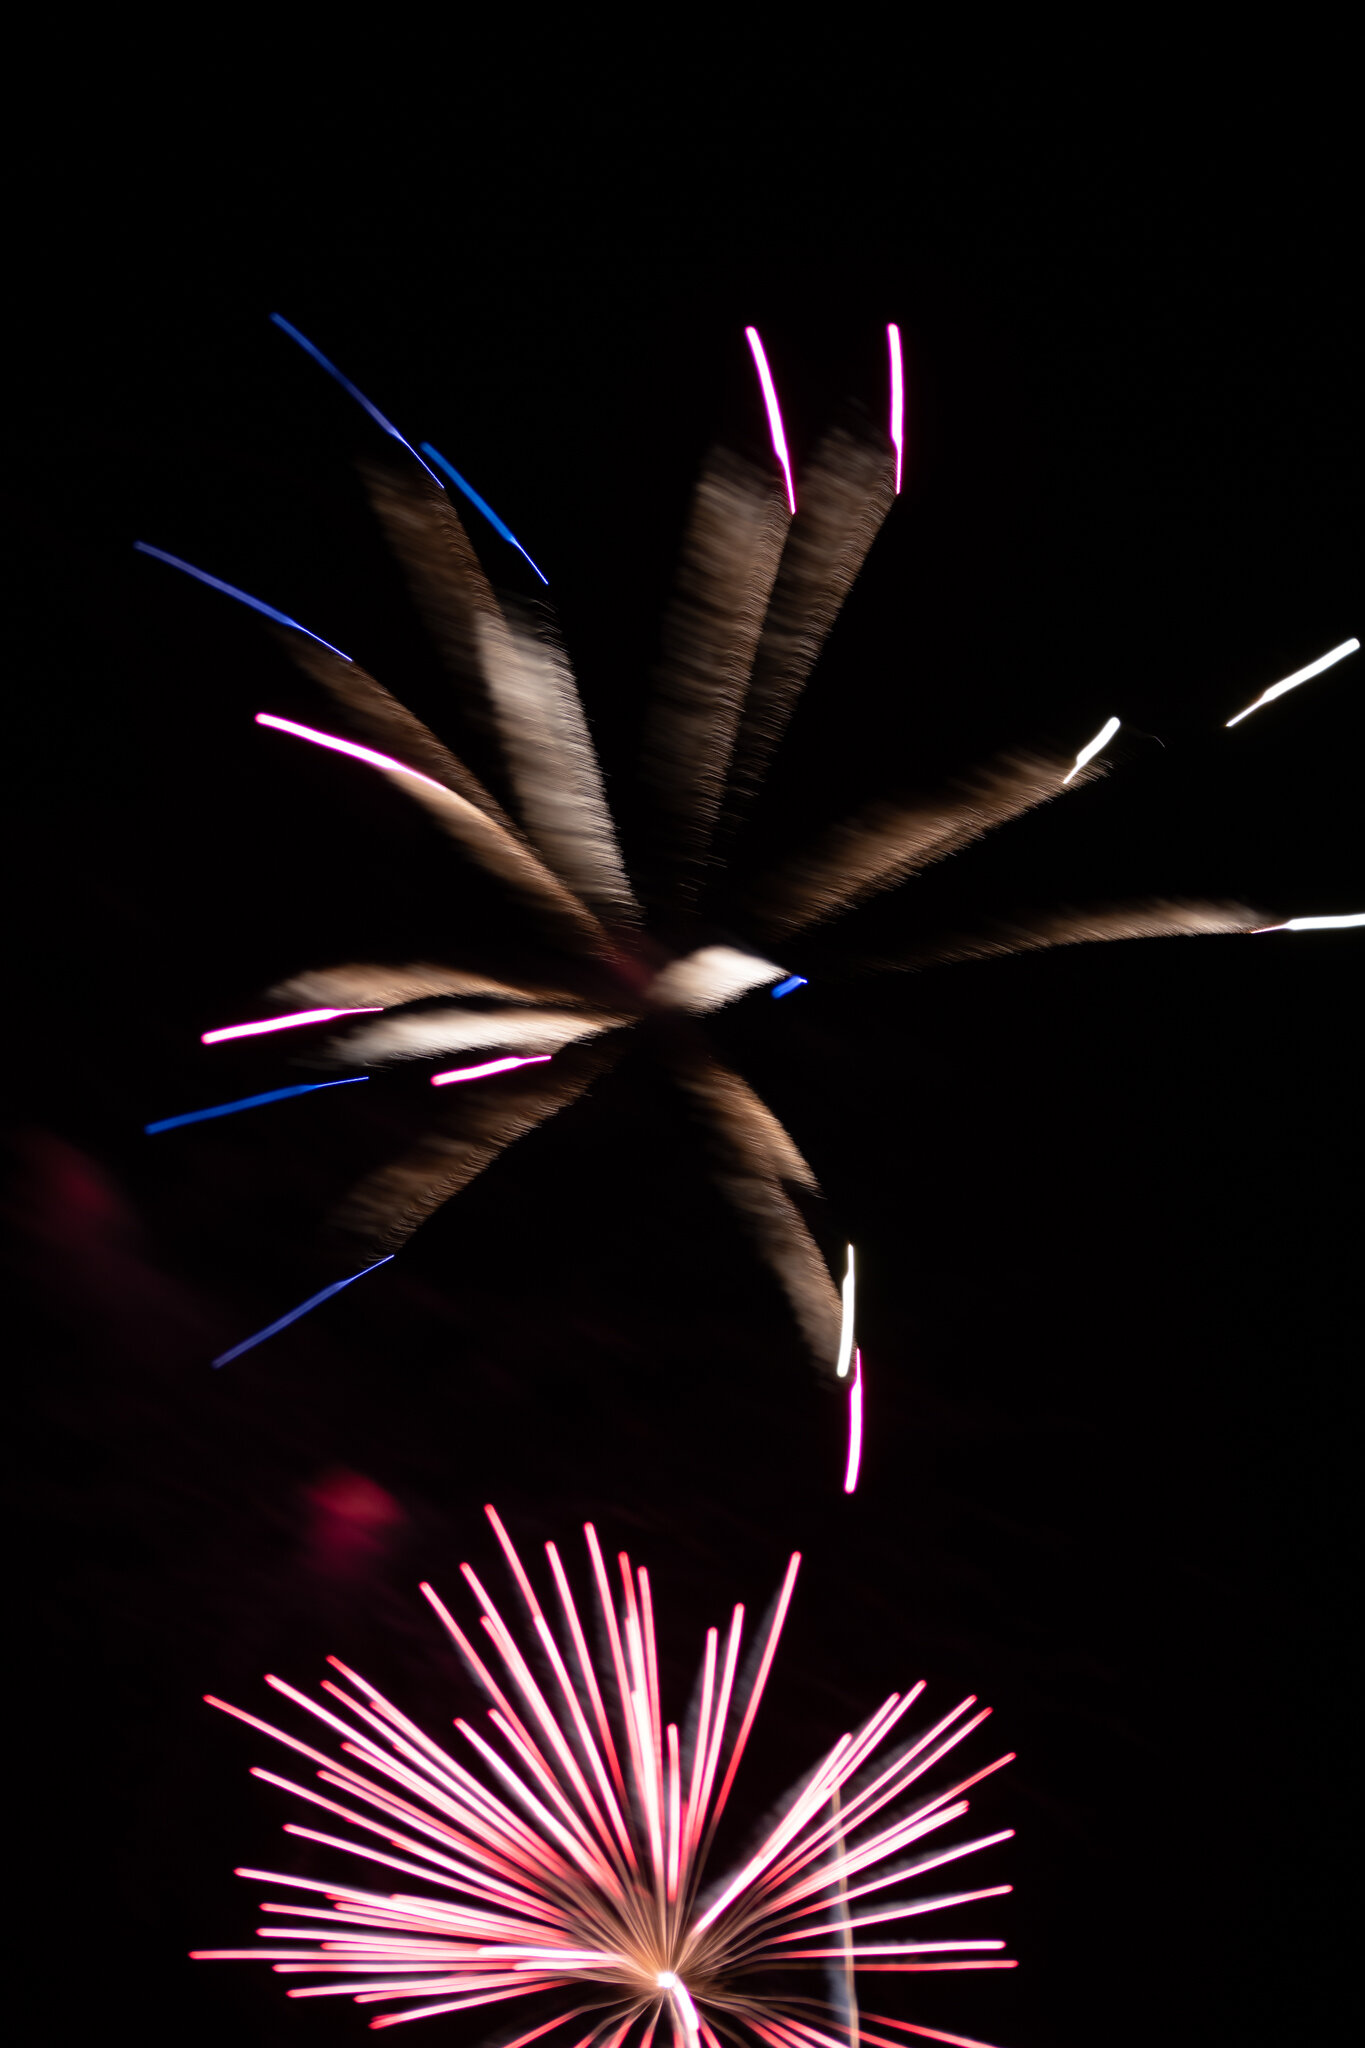 focuspulledfireworks-4.jpg